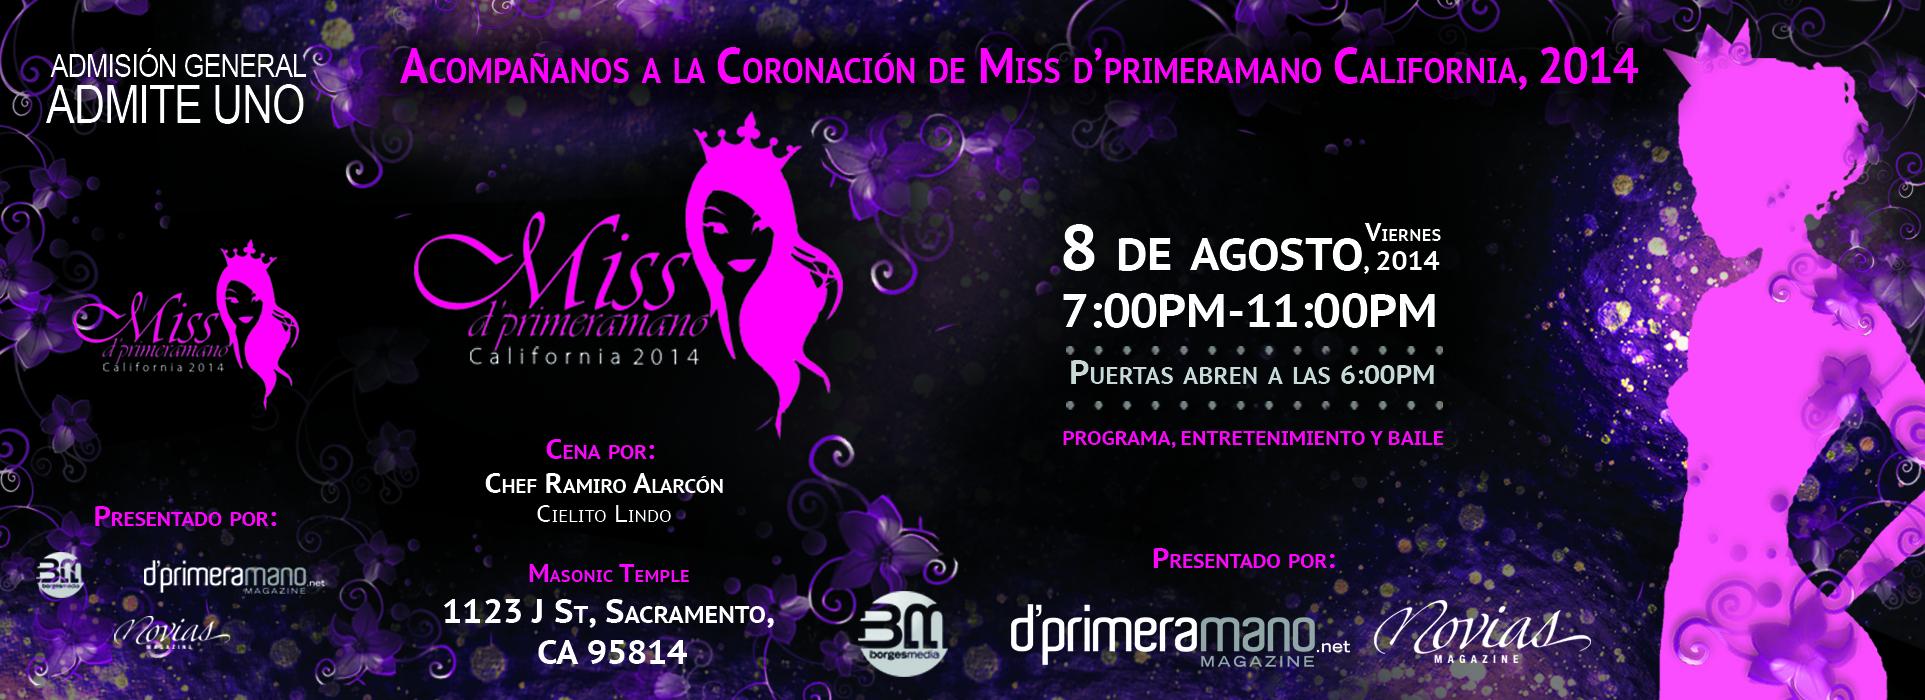 ticket for Miss Dprimeramano